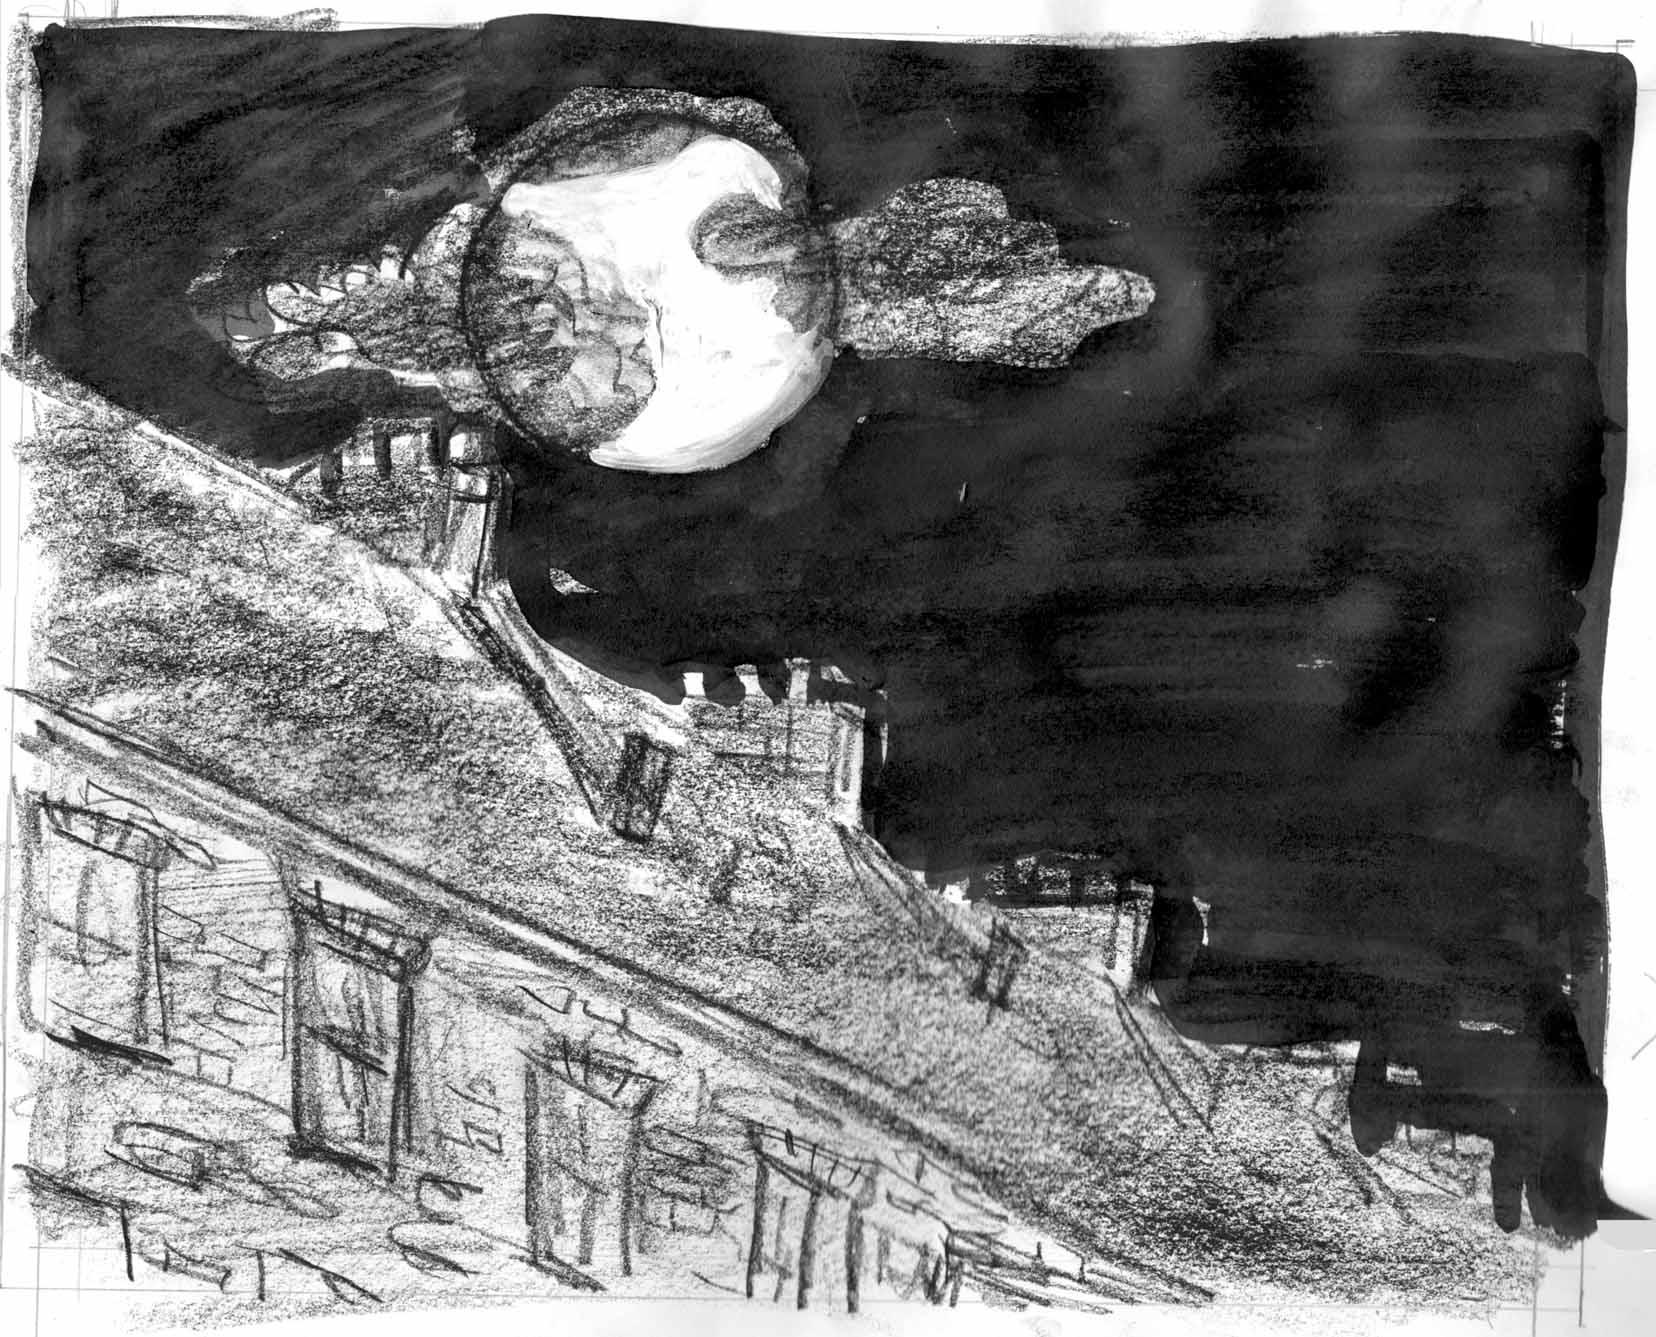 9-15-16-moon-over-roof-sktch